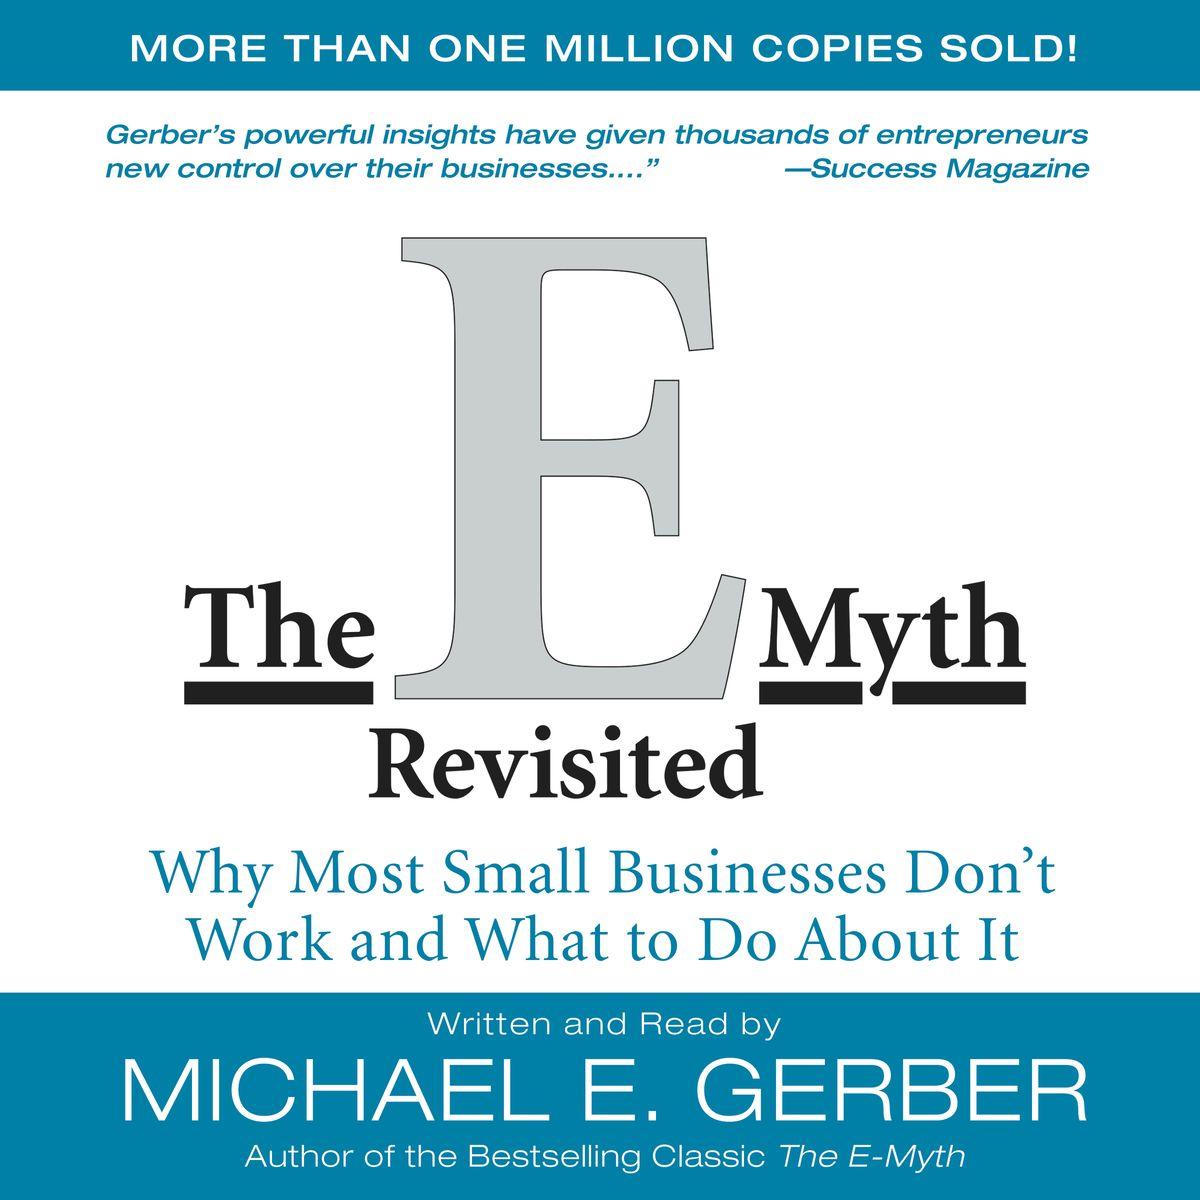 the-e-myth-revisited-1.jpg